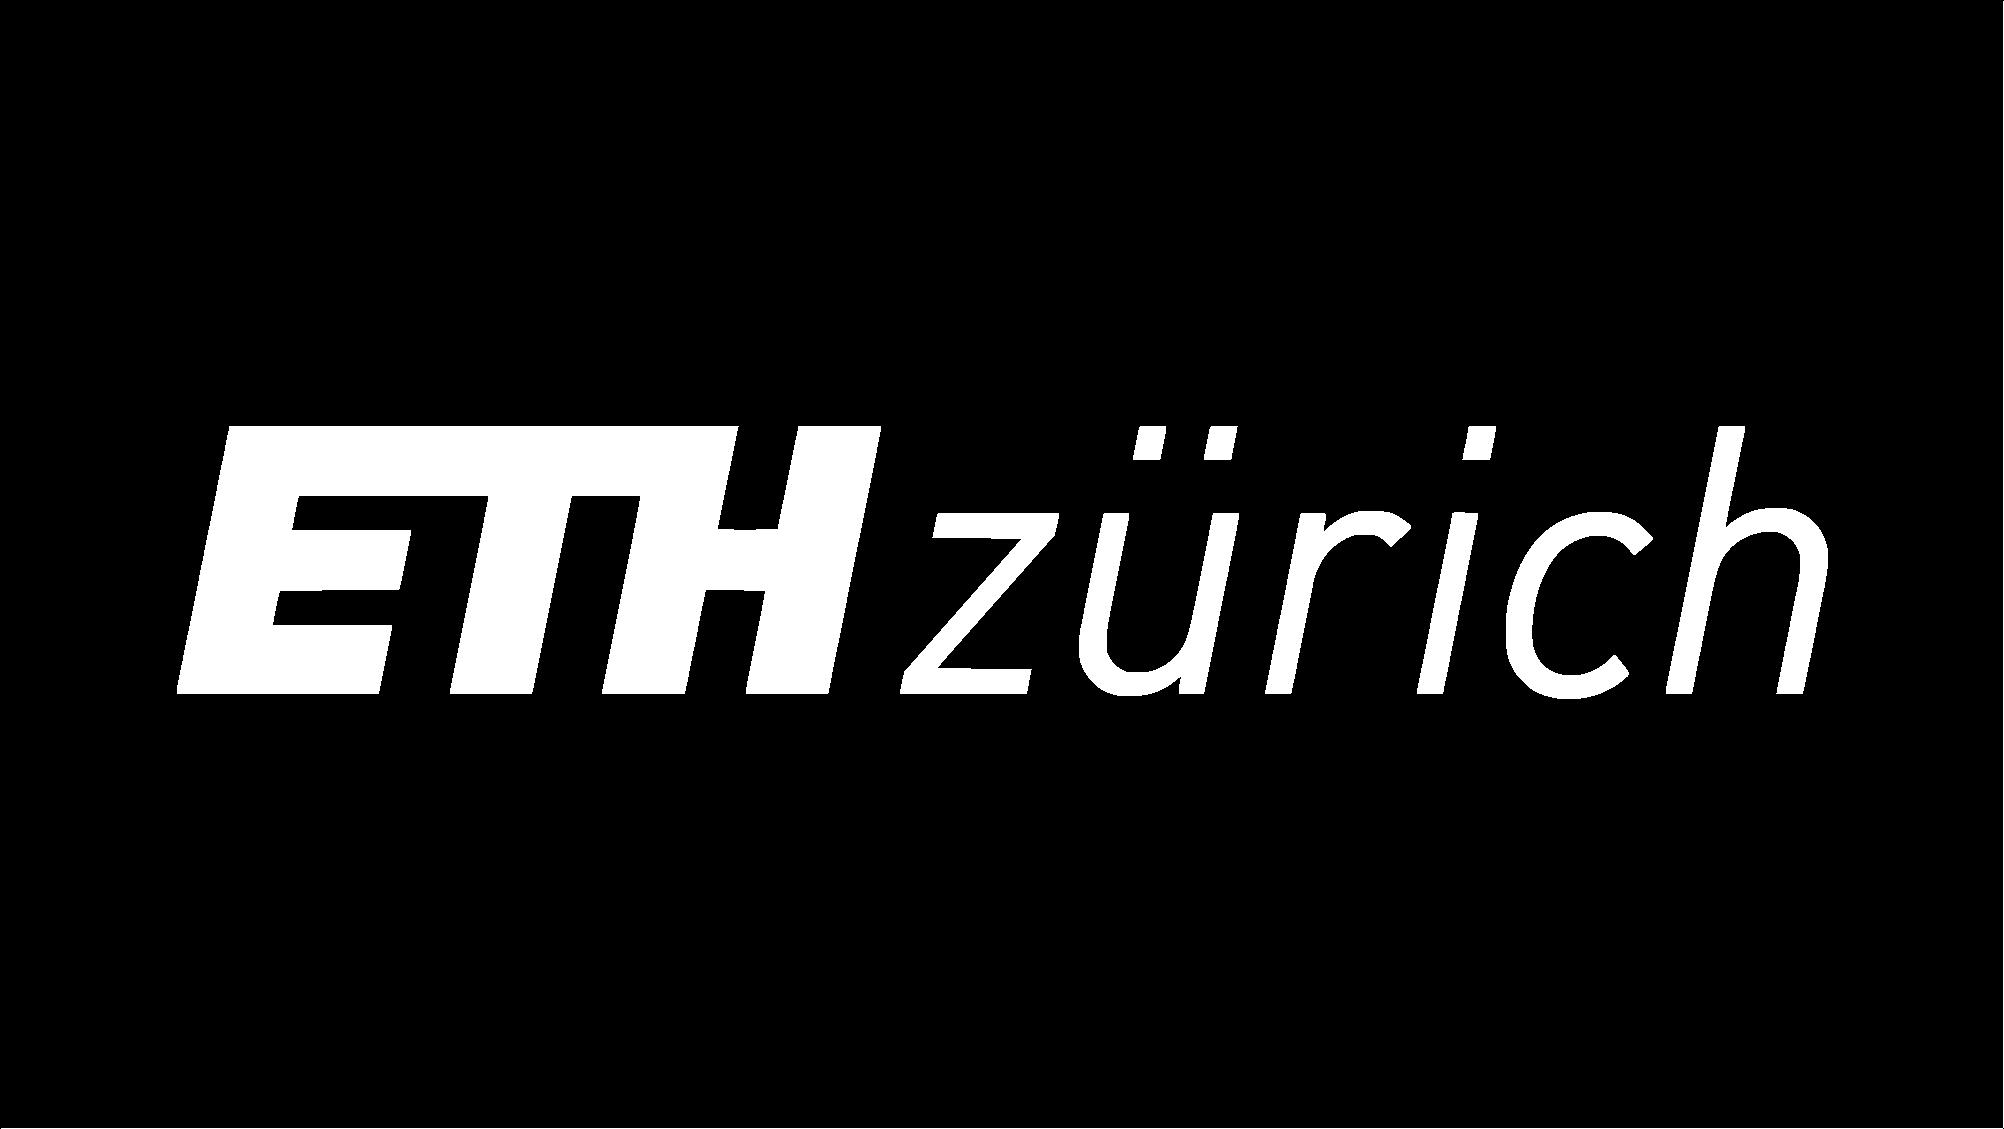 ethz_logo_white